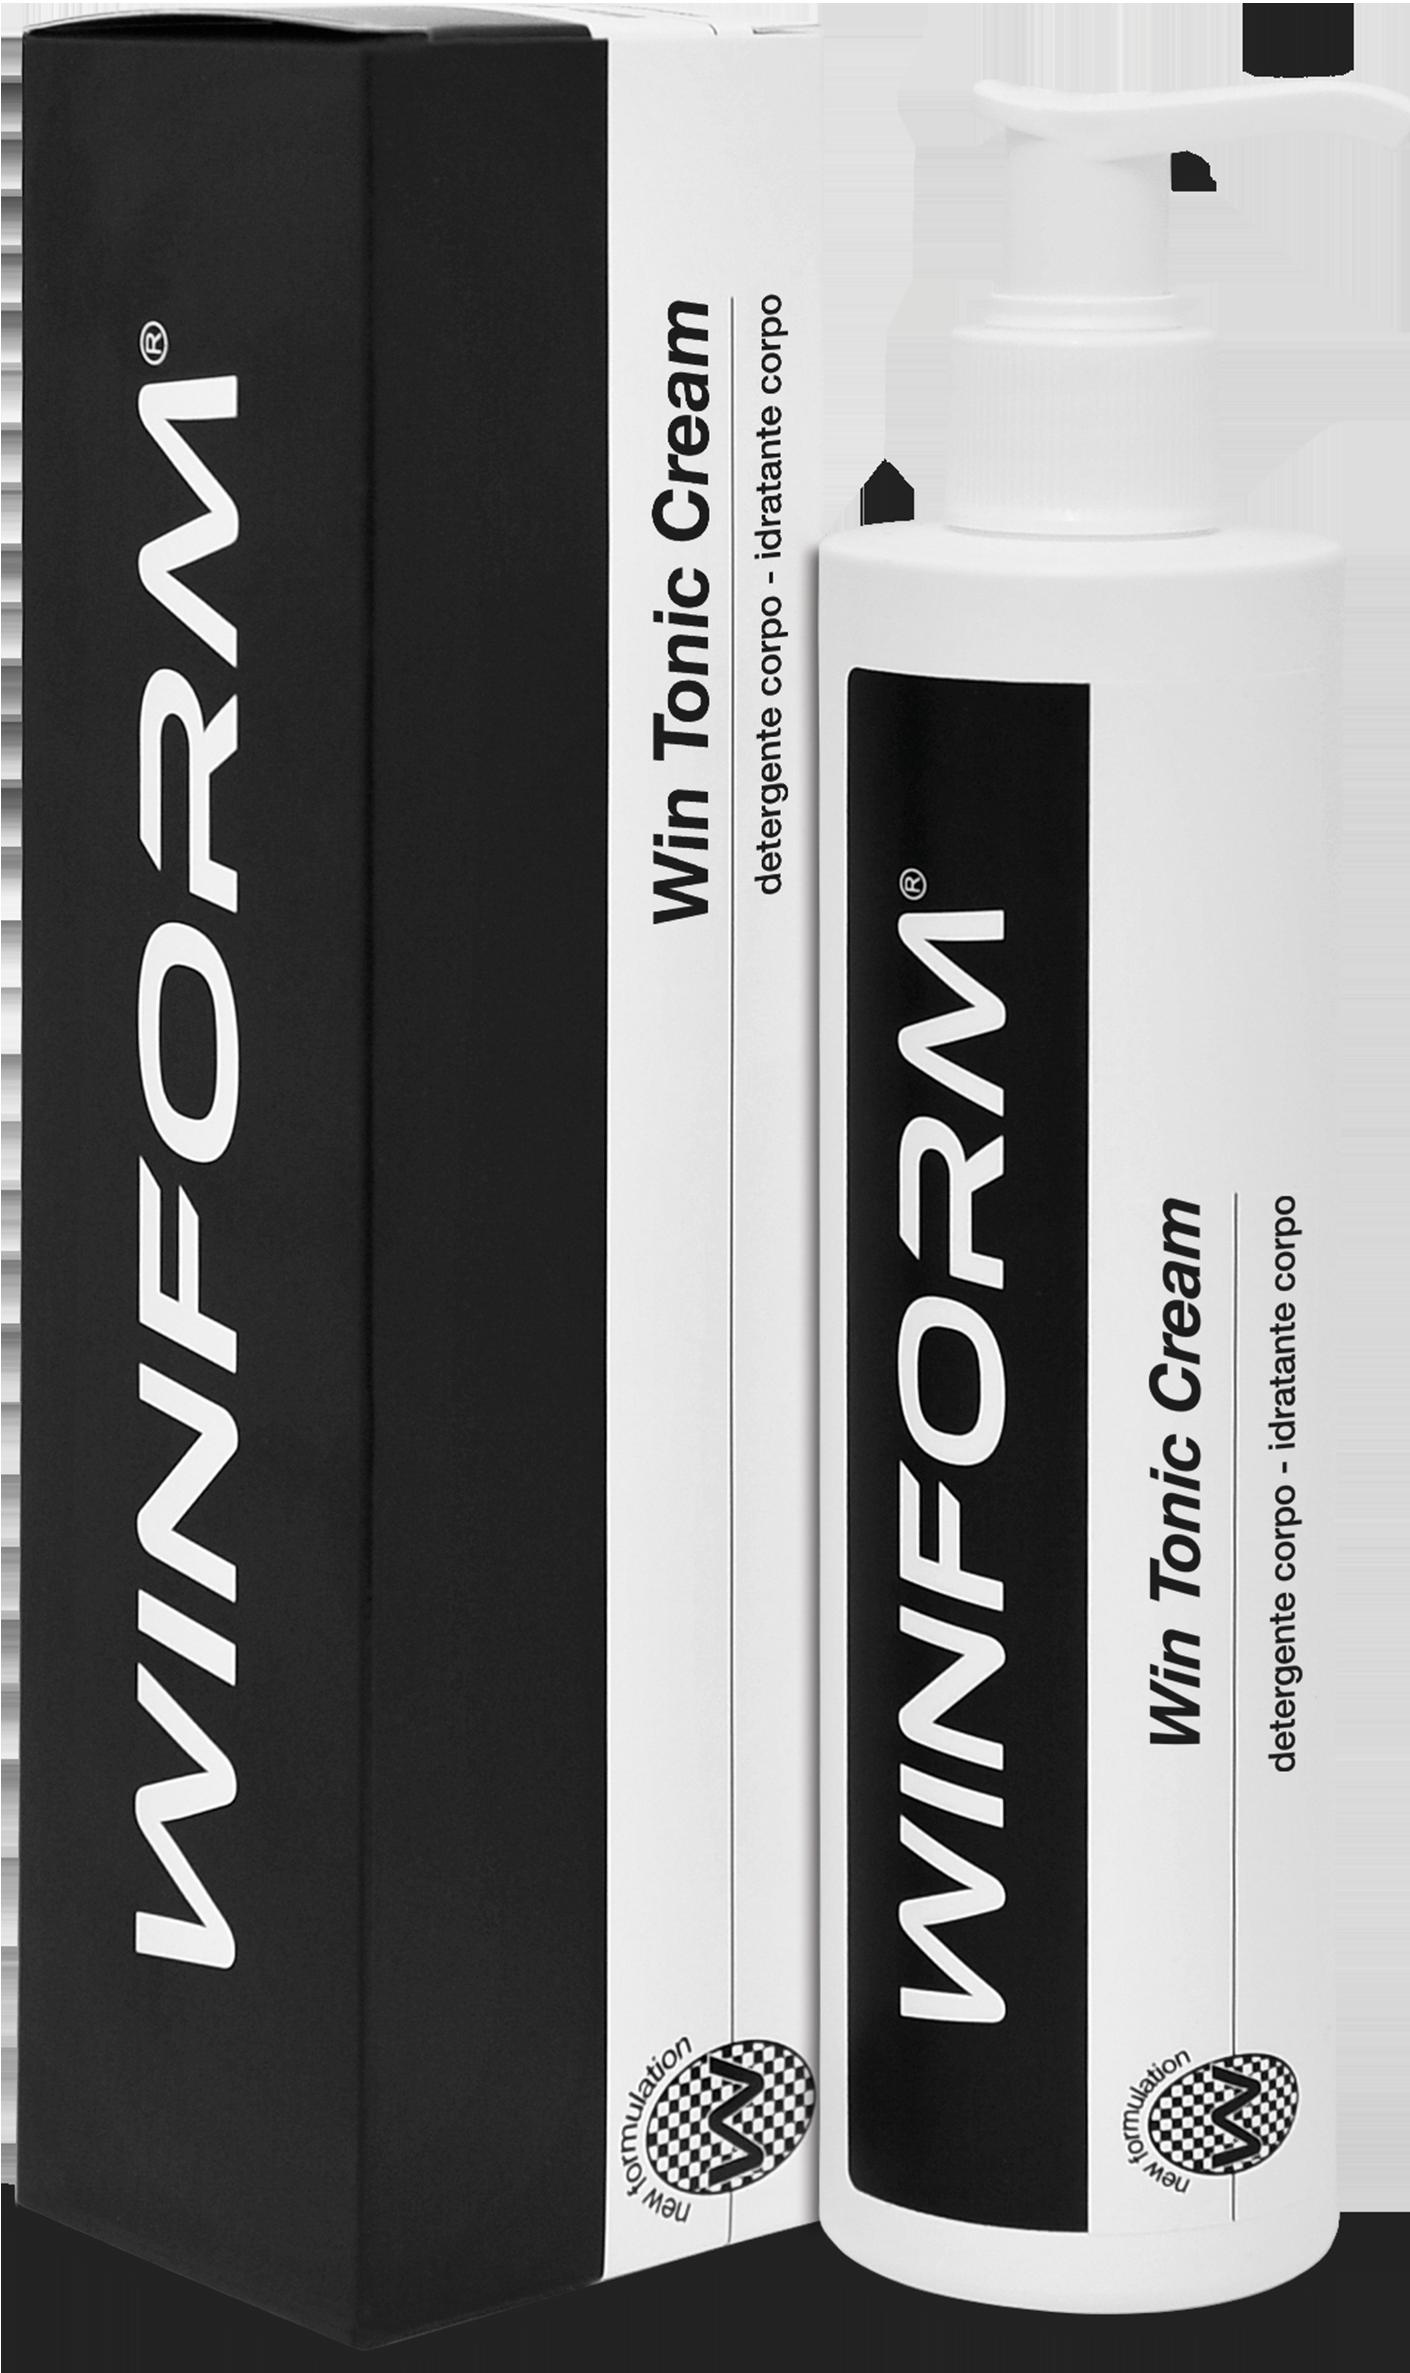 win tonic cream winform. Black Bedroom Furniture Sets. Home Design Ideas